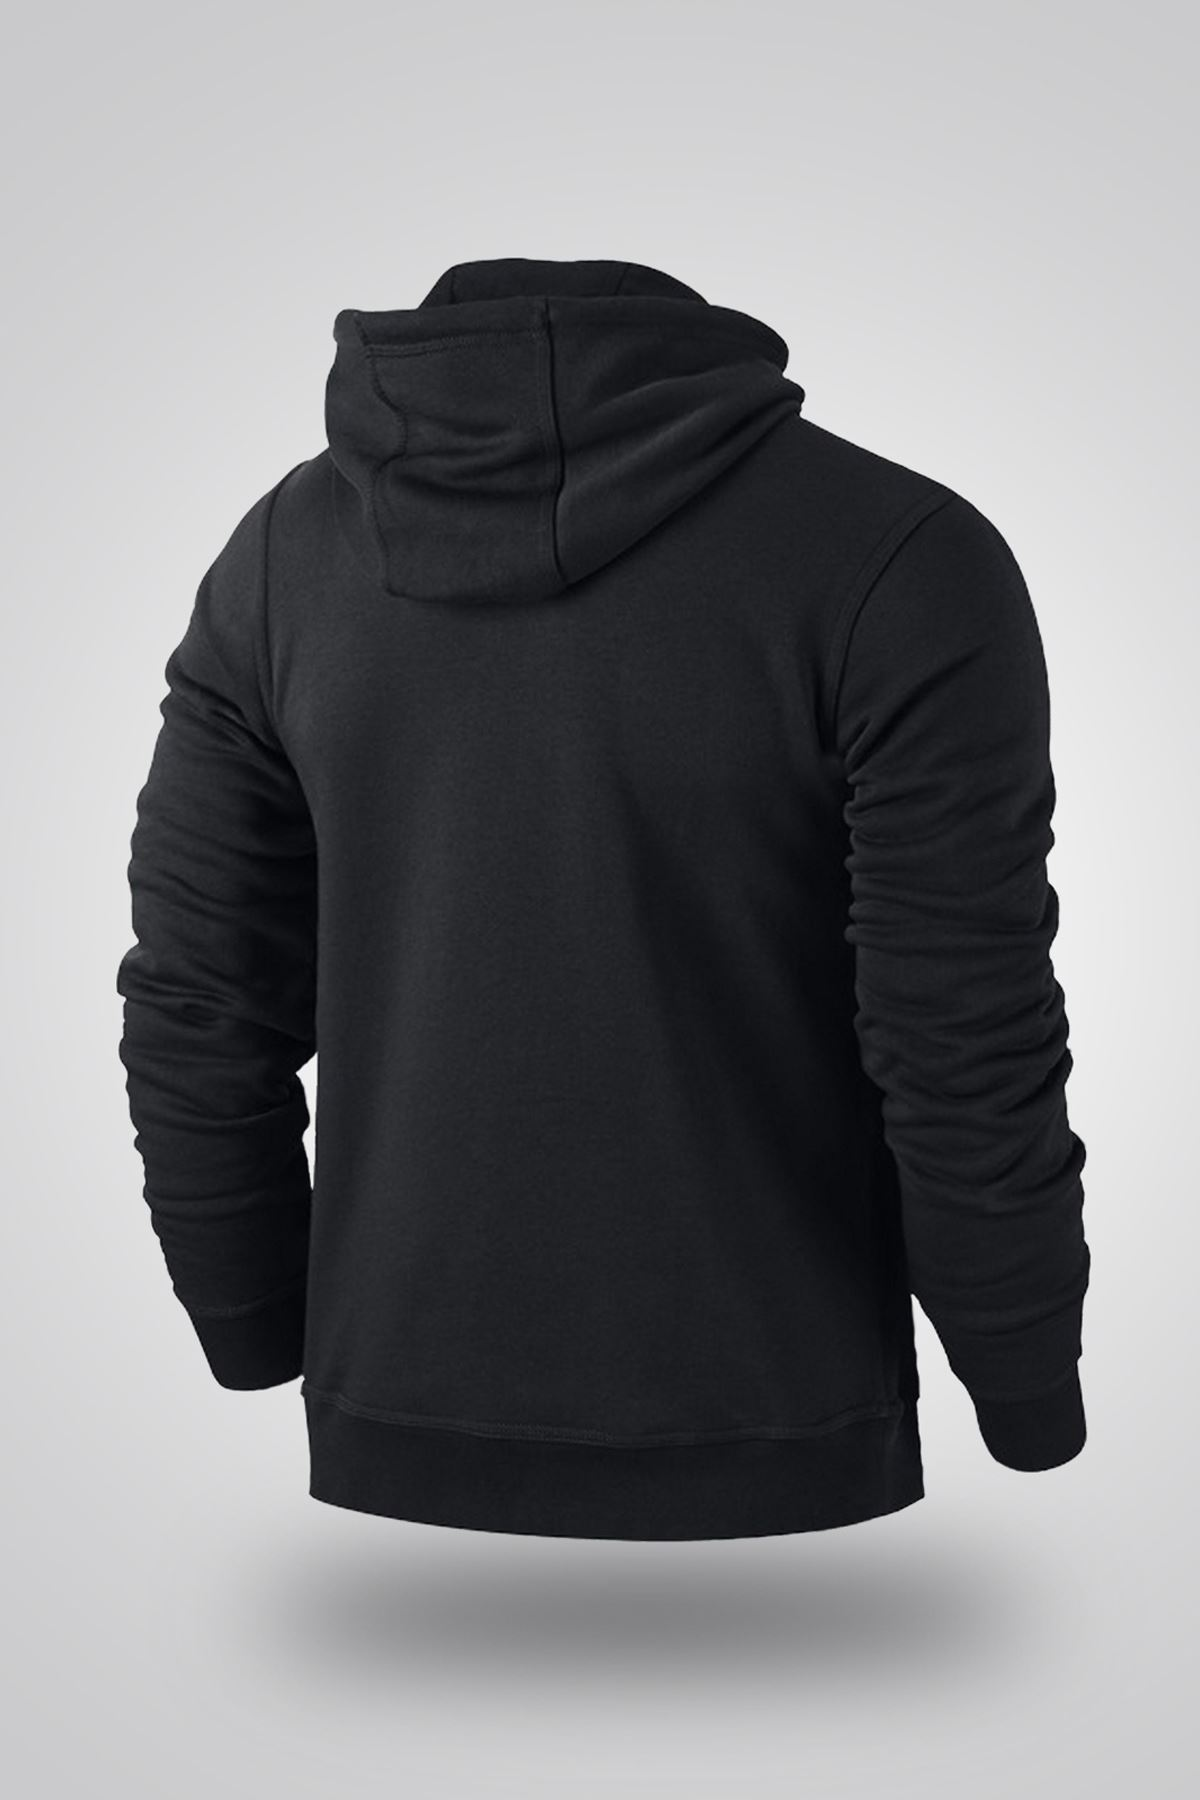 Air Jordan 04 Siyah NBA Erkek Kapşonlu Sweatshirt - Hoodie